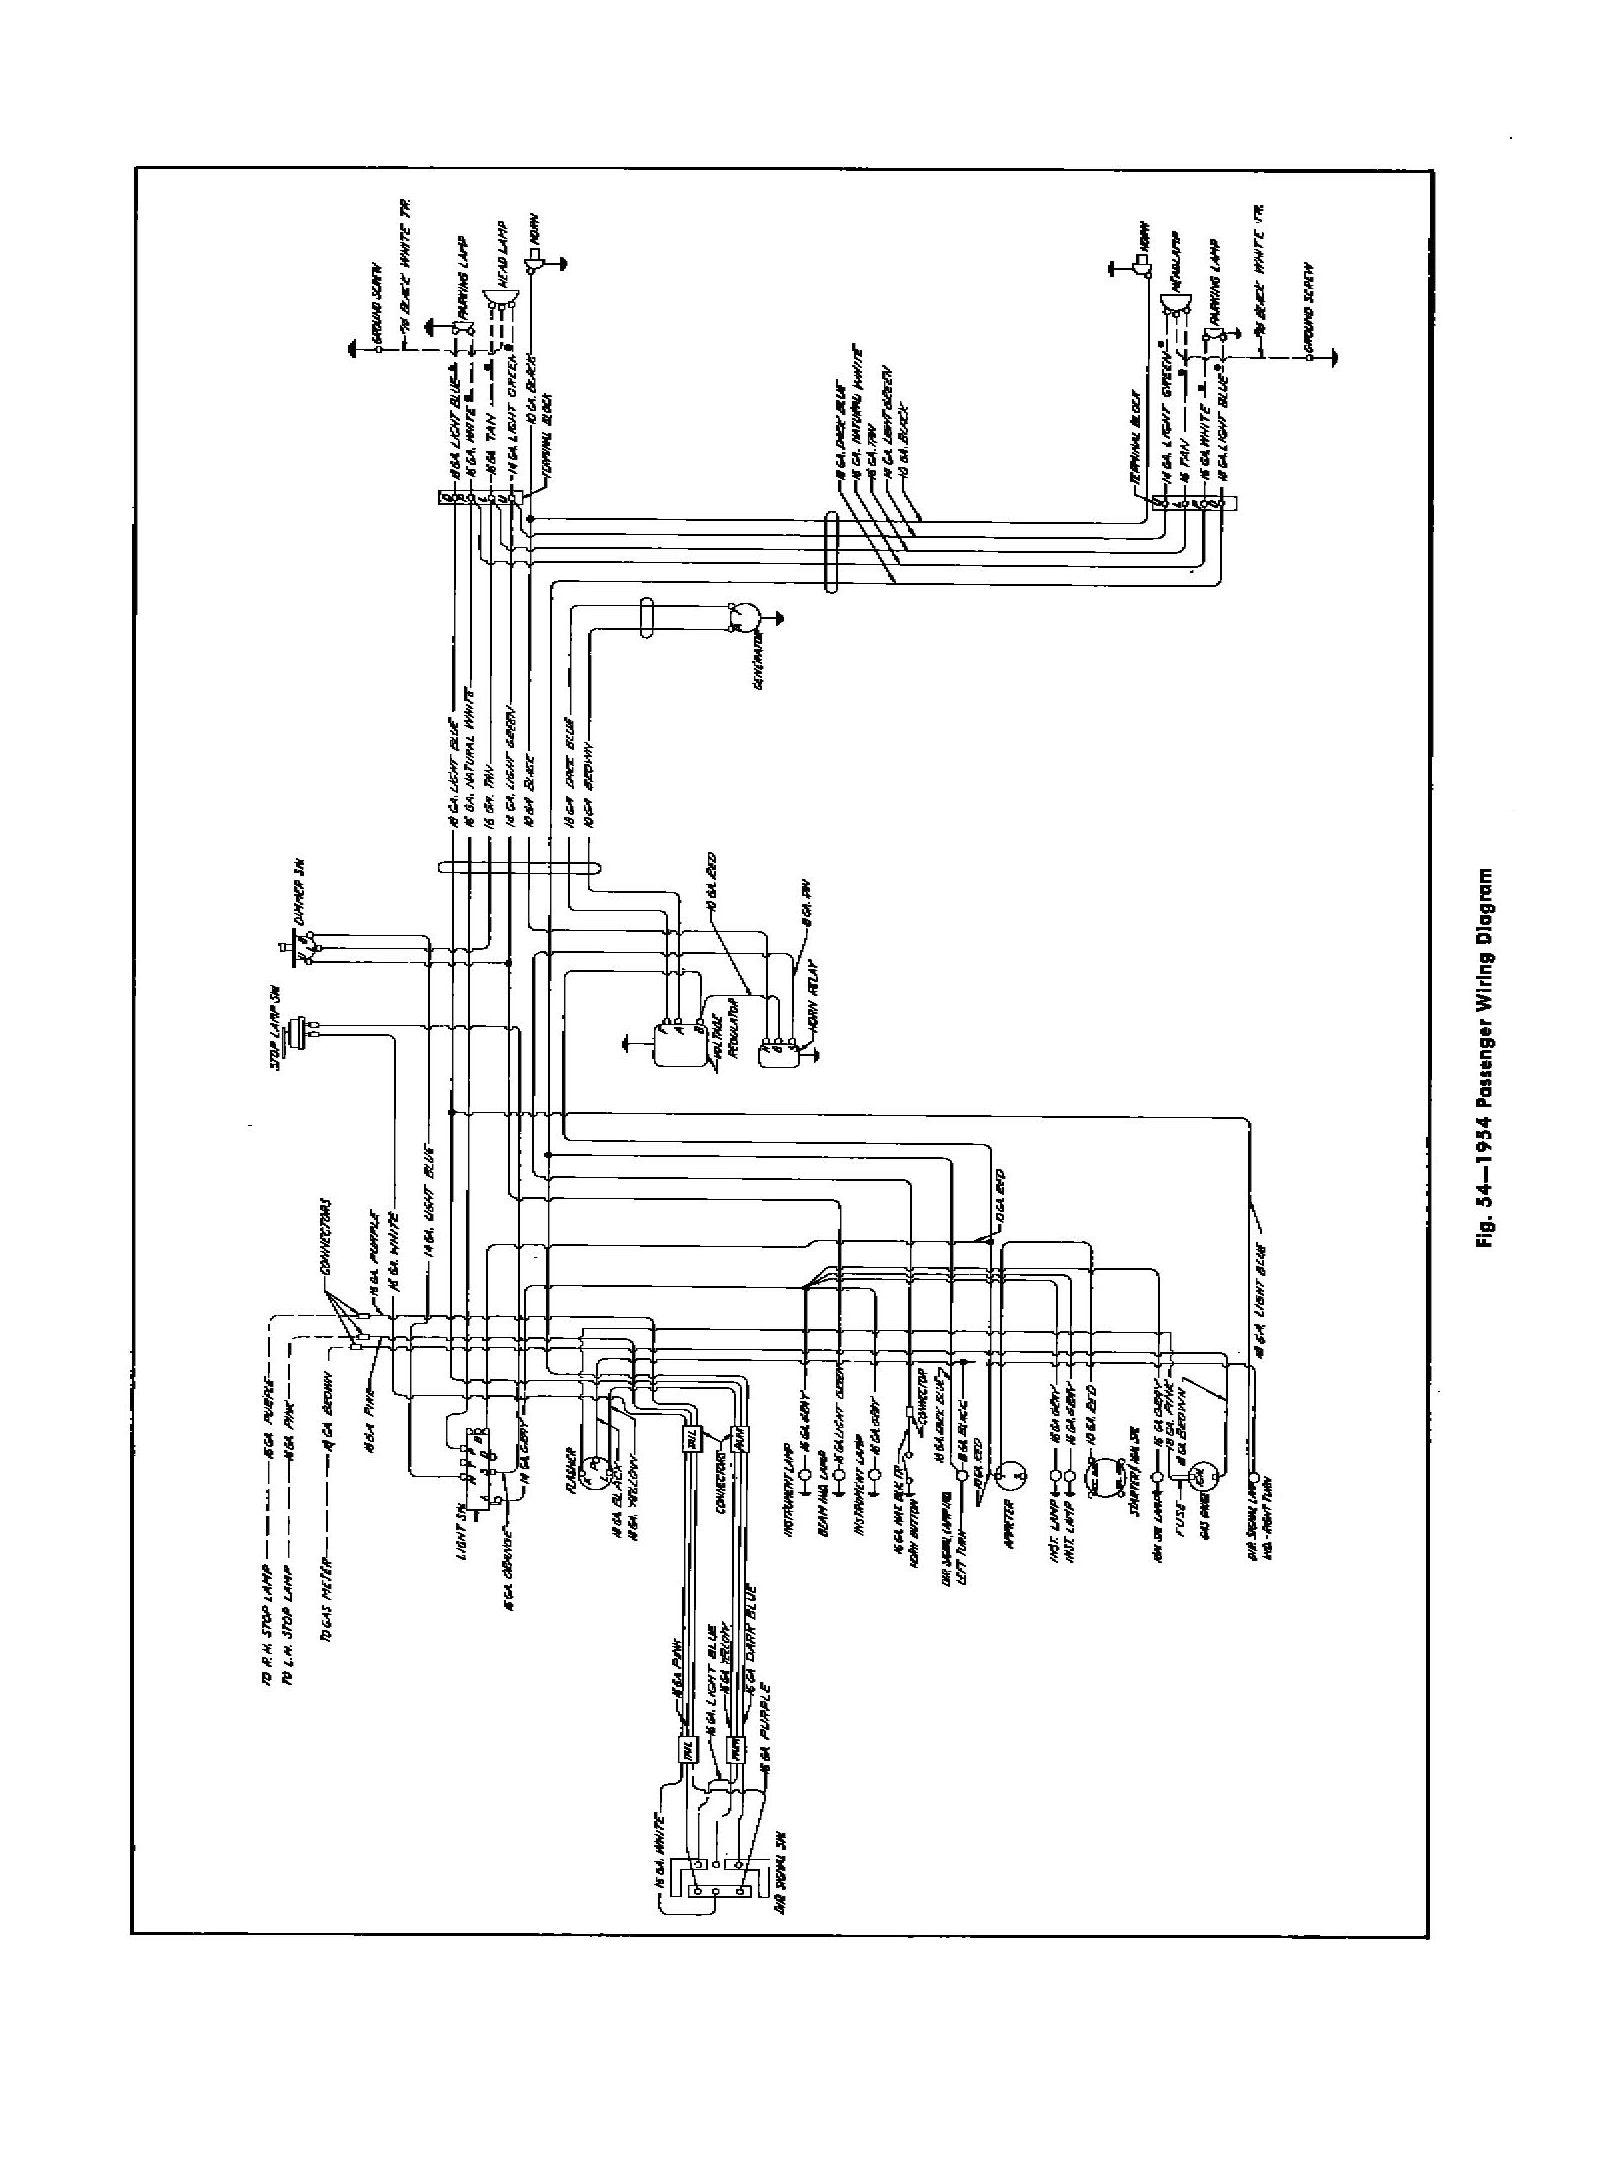 1957 chevrolet truck wiring diagram cutler hammer reversing starter 1954 chevy 3100 harness free